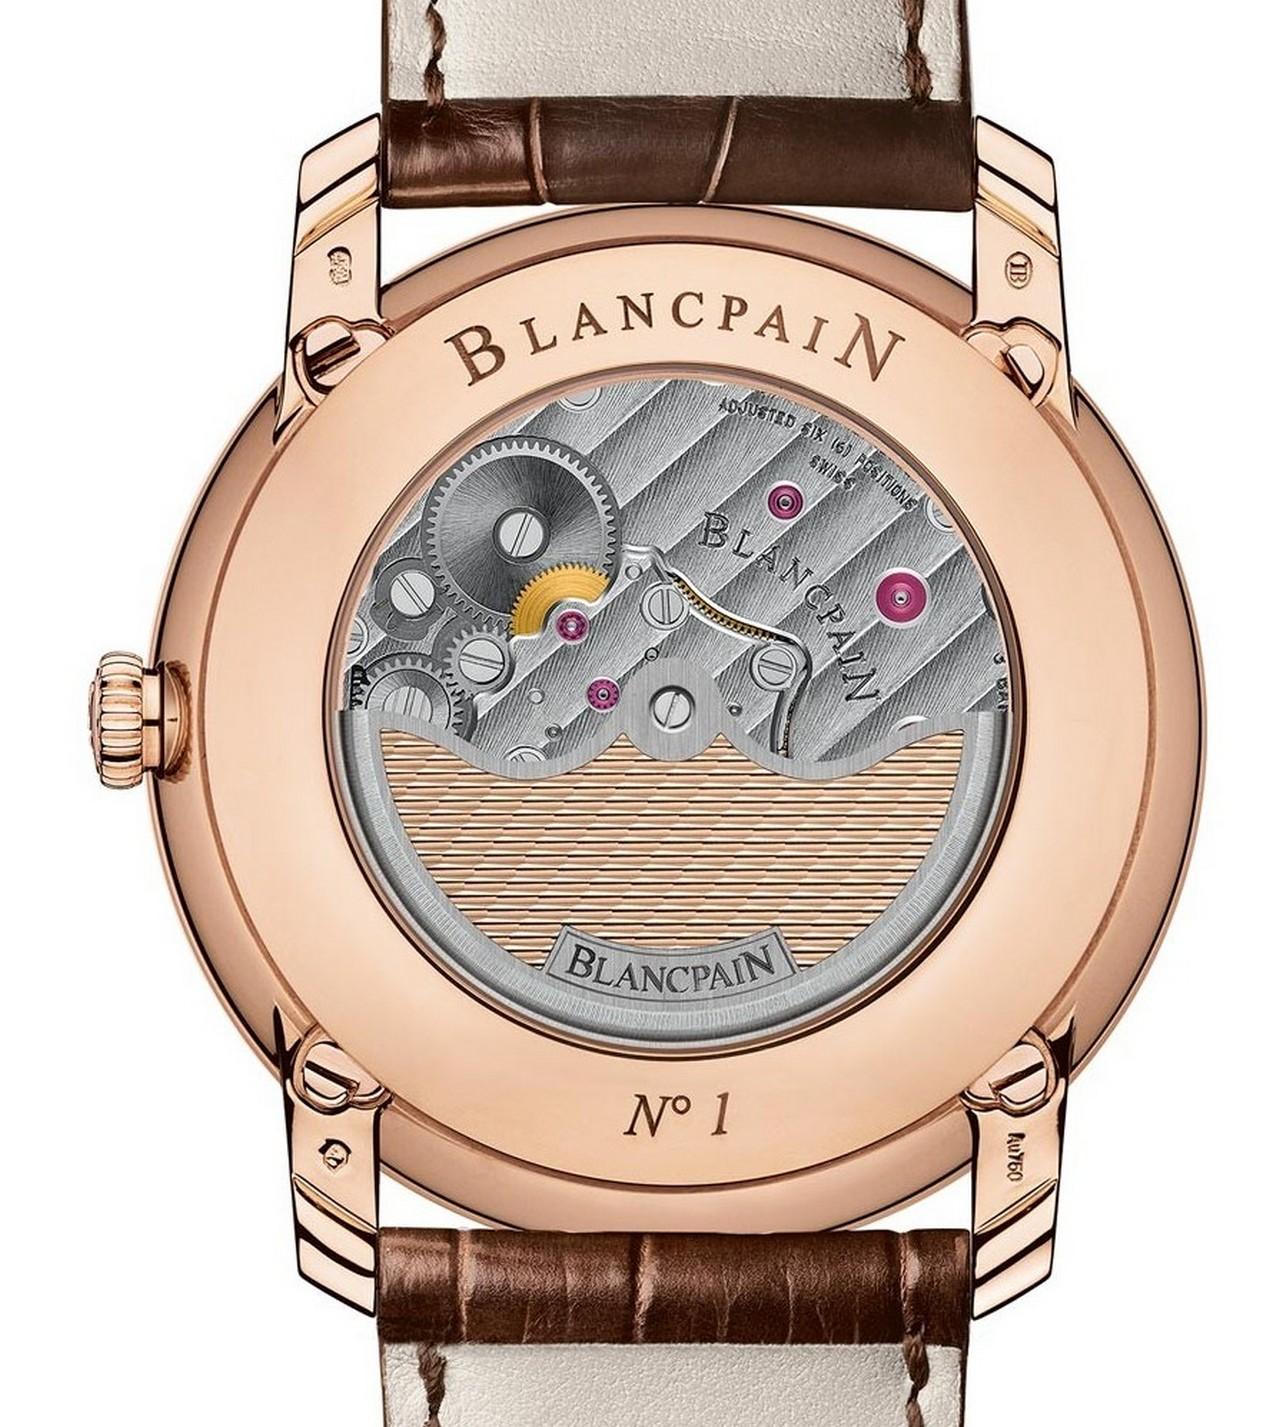 blancpain-villeret-quantieme-perpetuel-8-jours-ref-6659-3631-55b-prezzo-price-0-100_4